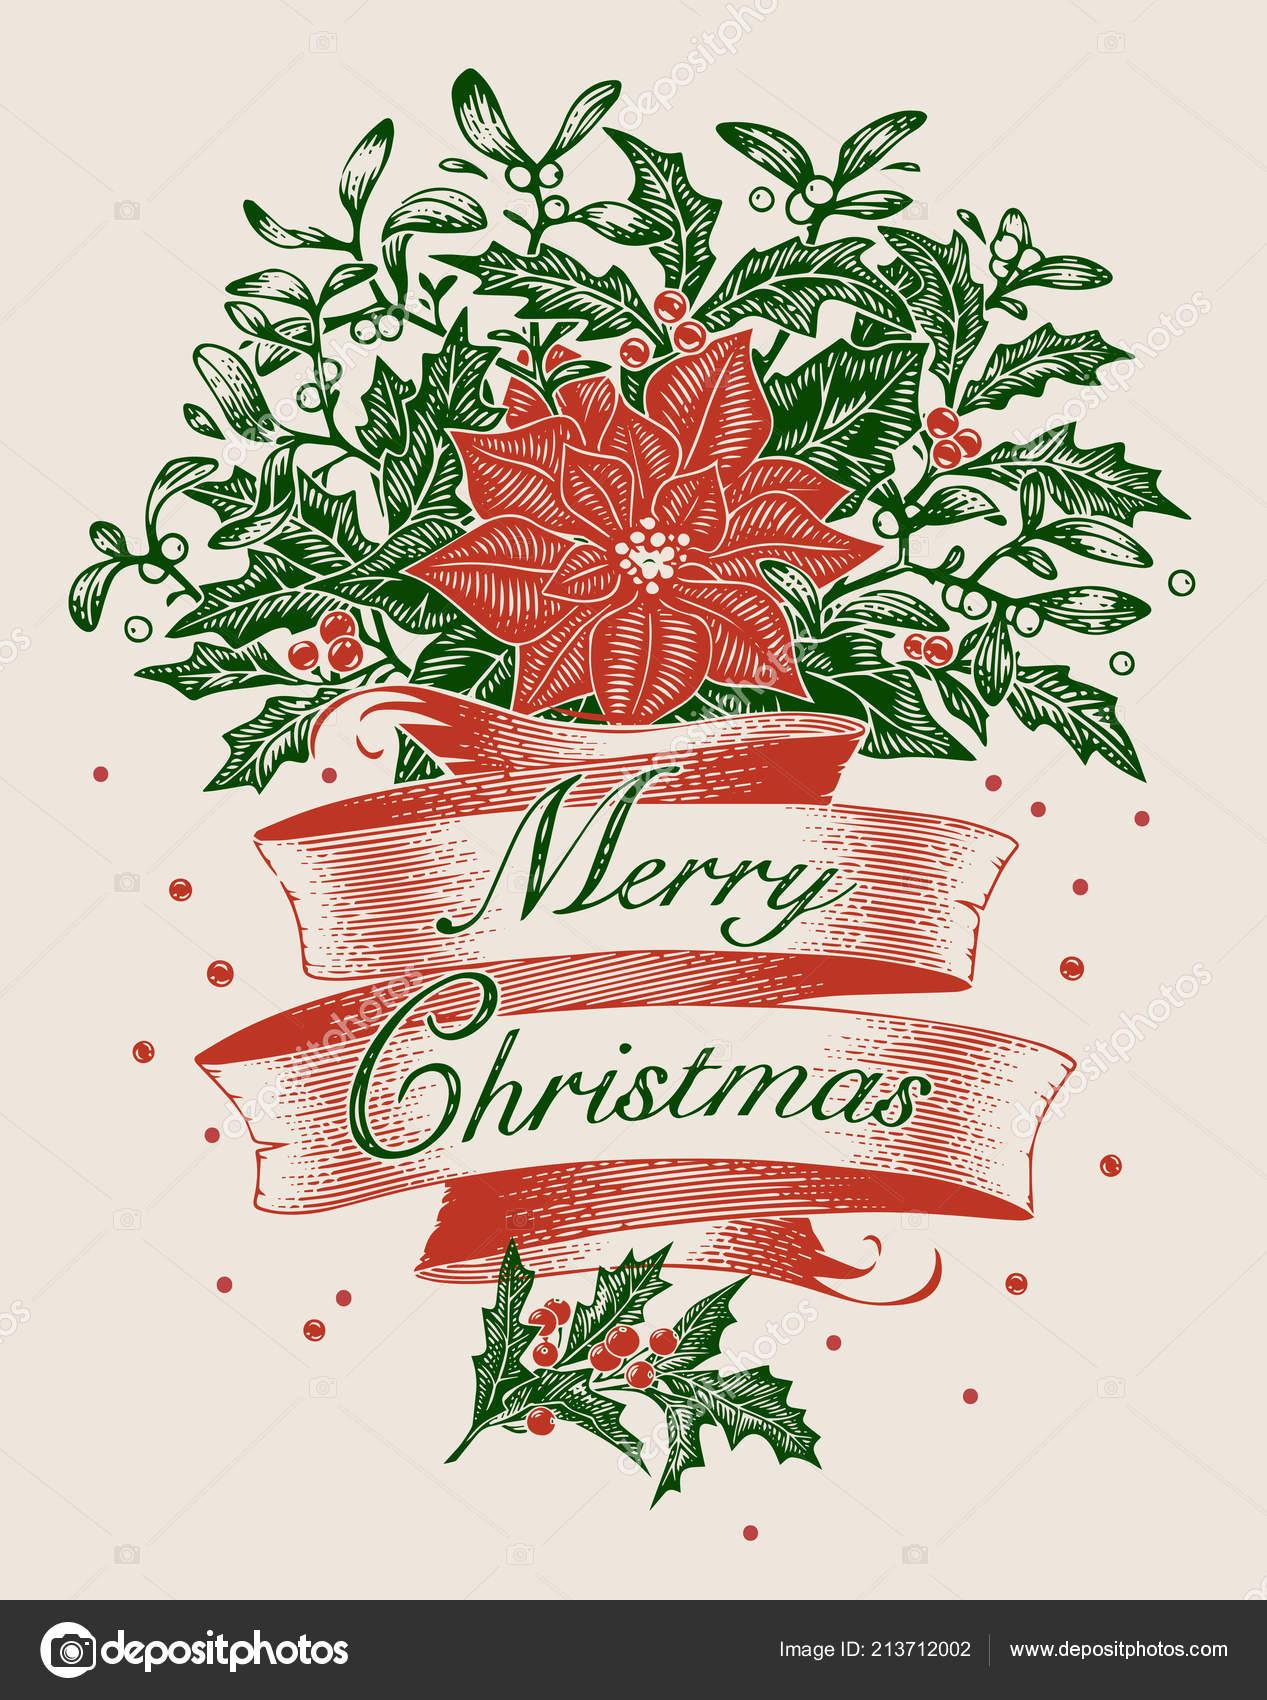 Vintage Engraving Christmas Art Greeting Card Poster Banner Vector